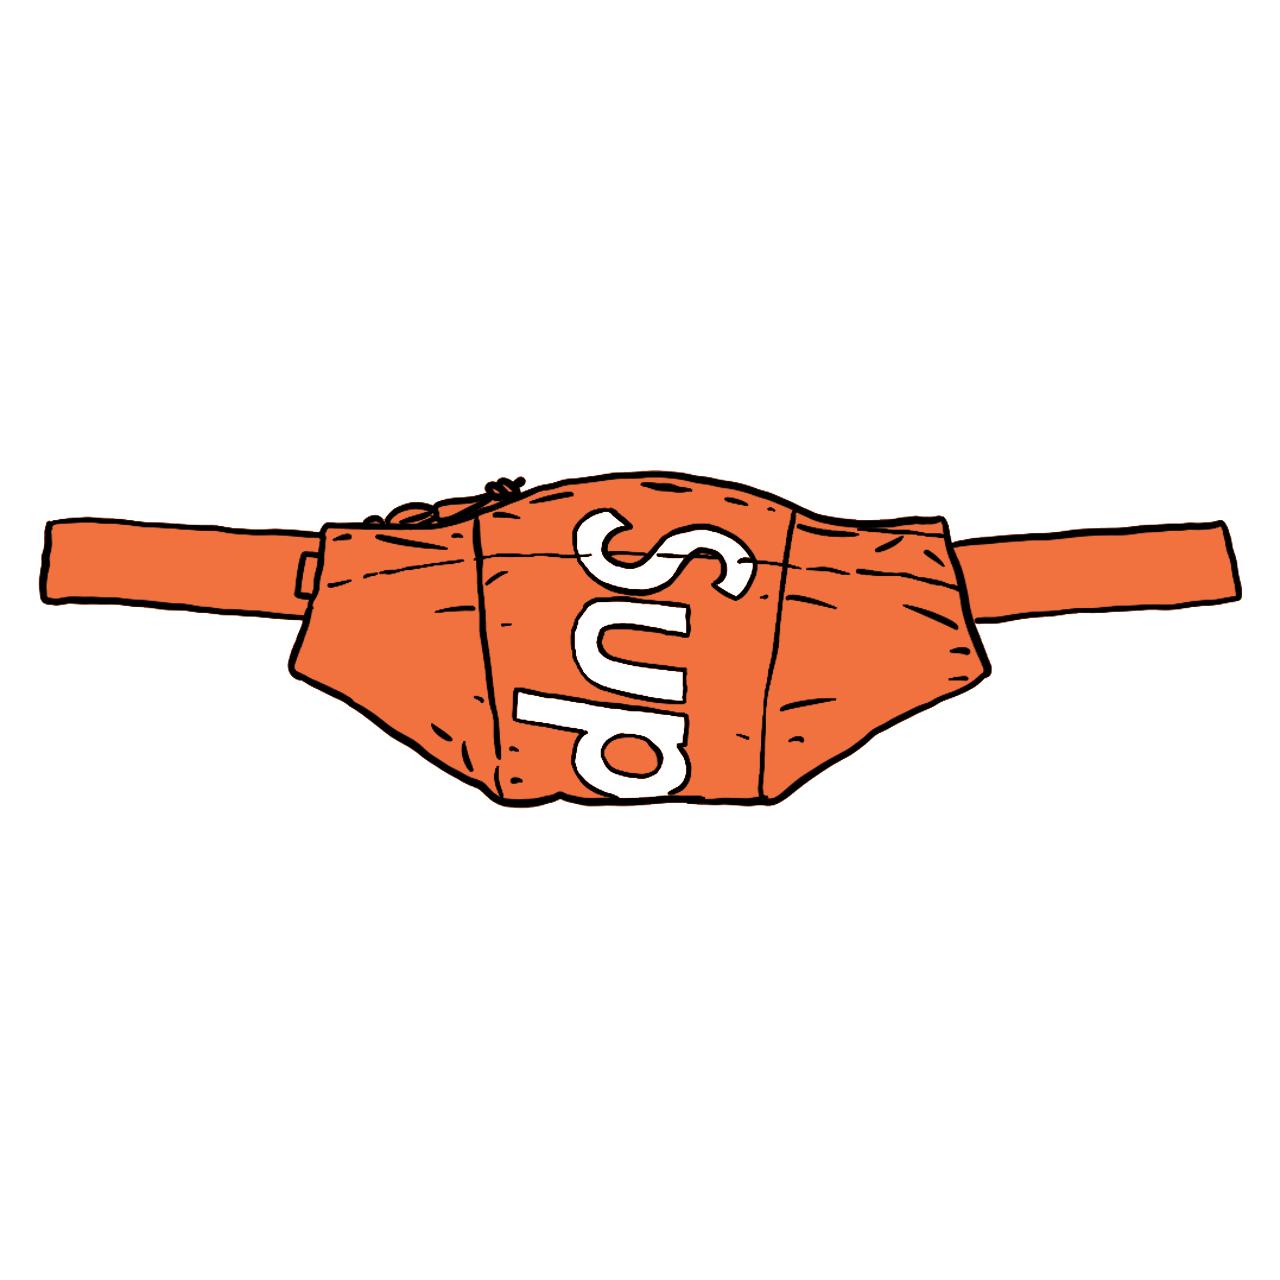 Supreme Waterproof Reflective Speckled Waist Bag Orange